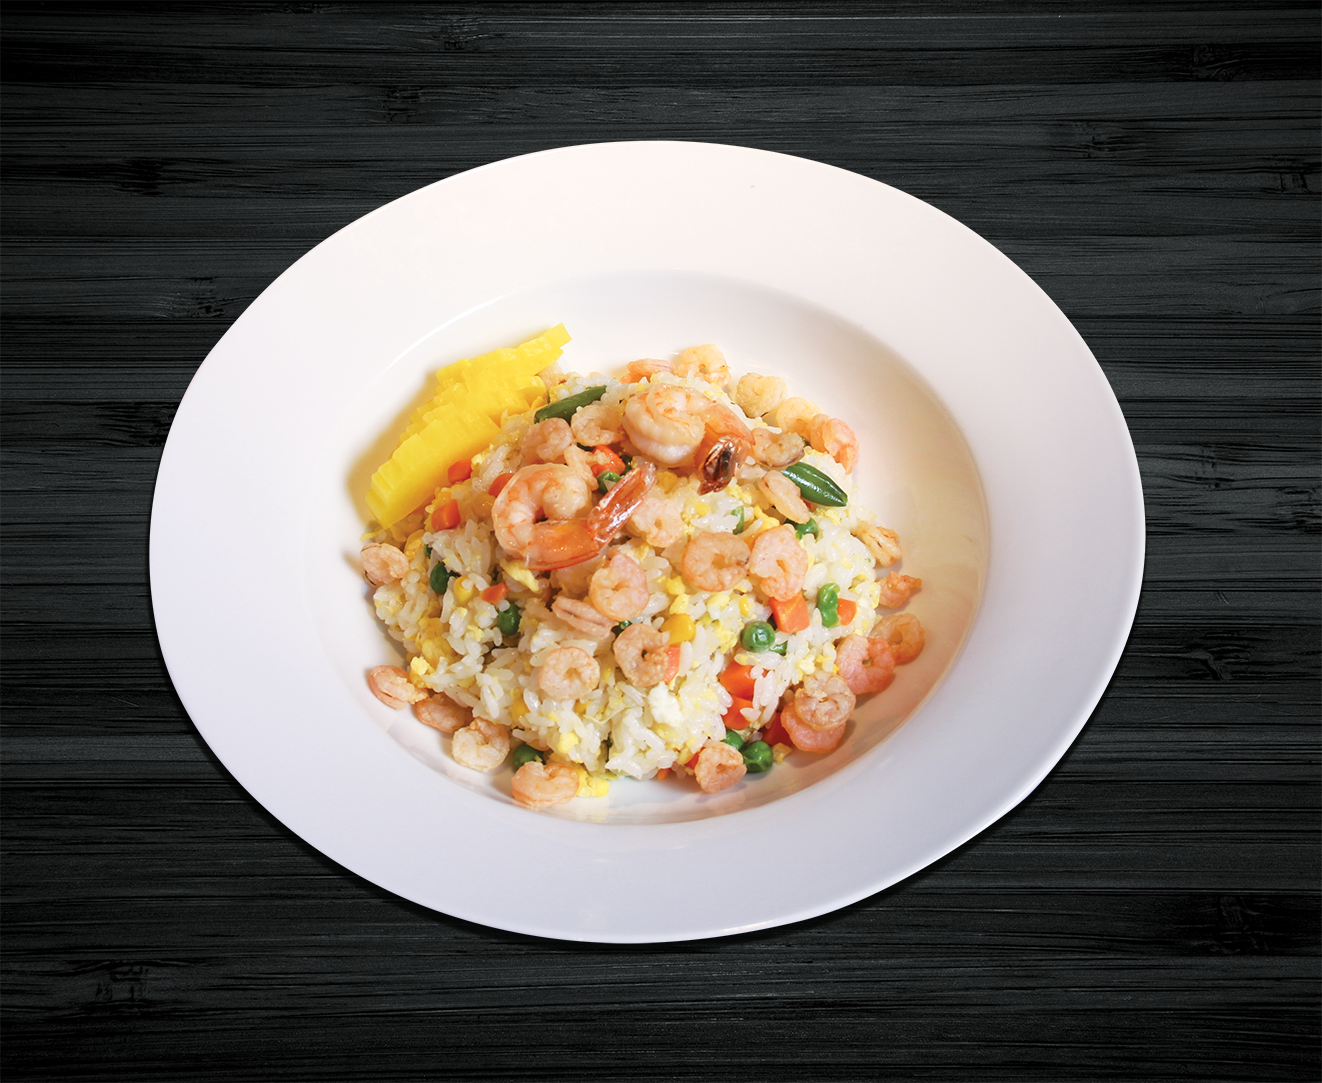 KidsMeal - Fried Rice with Shrimp